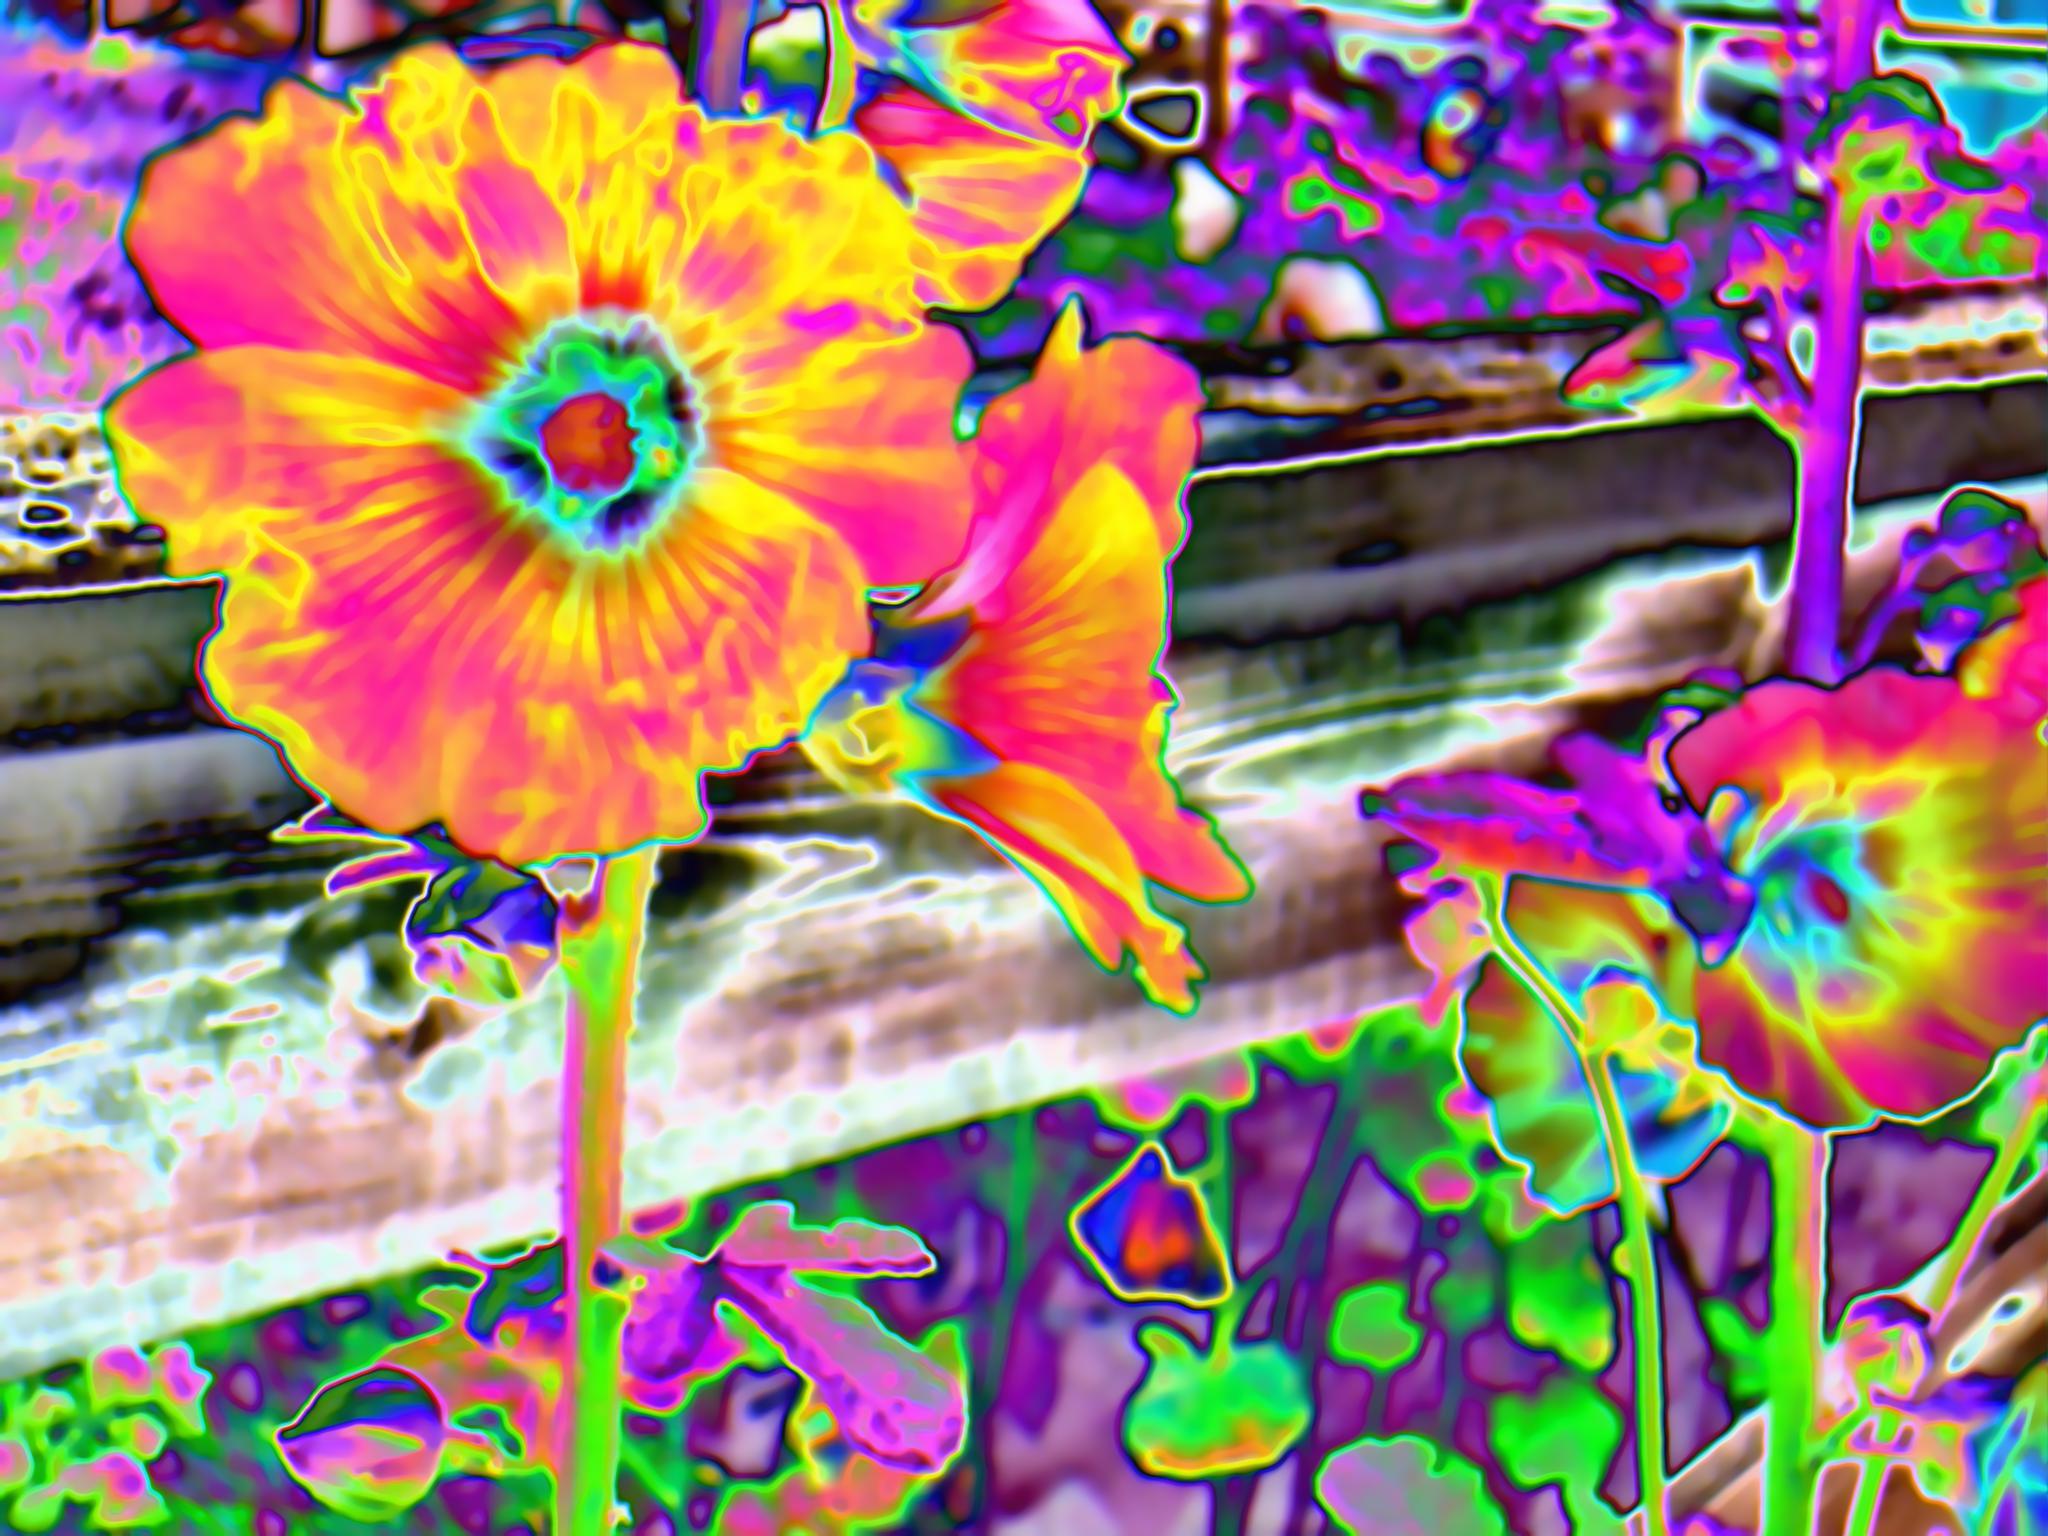 3d Pikachu Wallpaper Free Download Acid Trip Background Pixelstalk Net